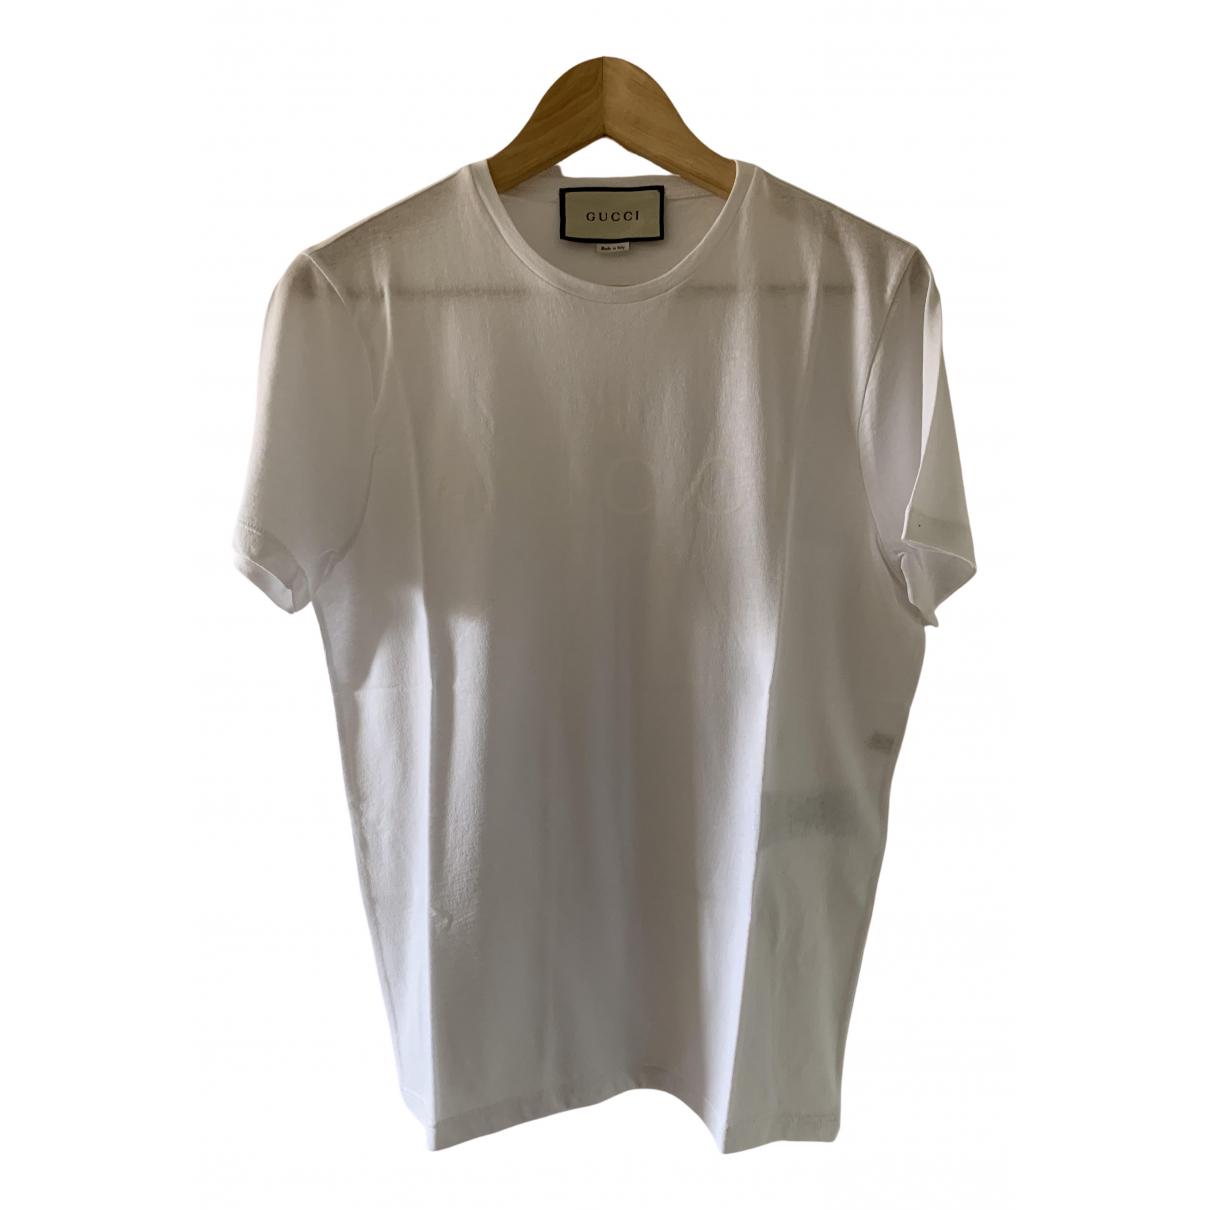 Gucci \N White Cotton T-shirts for Men S International